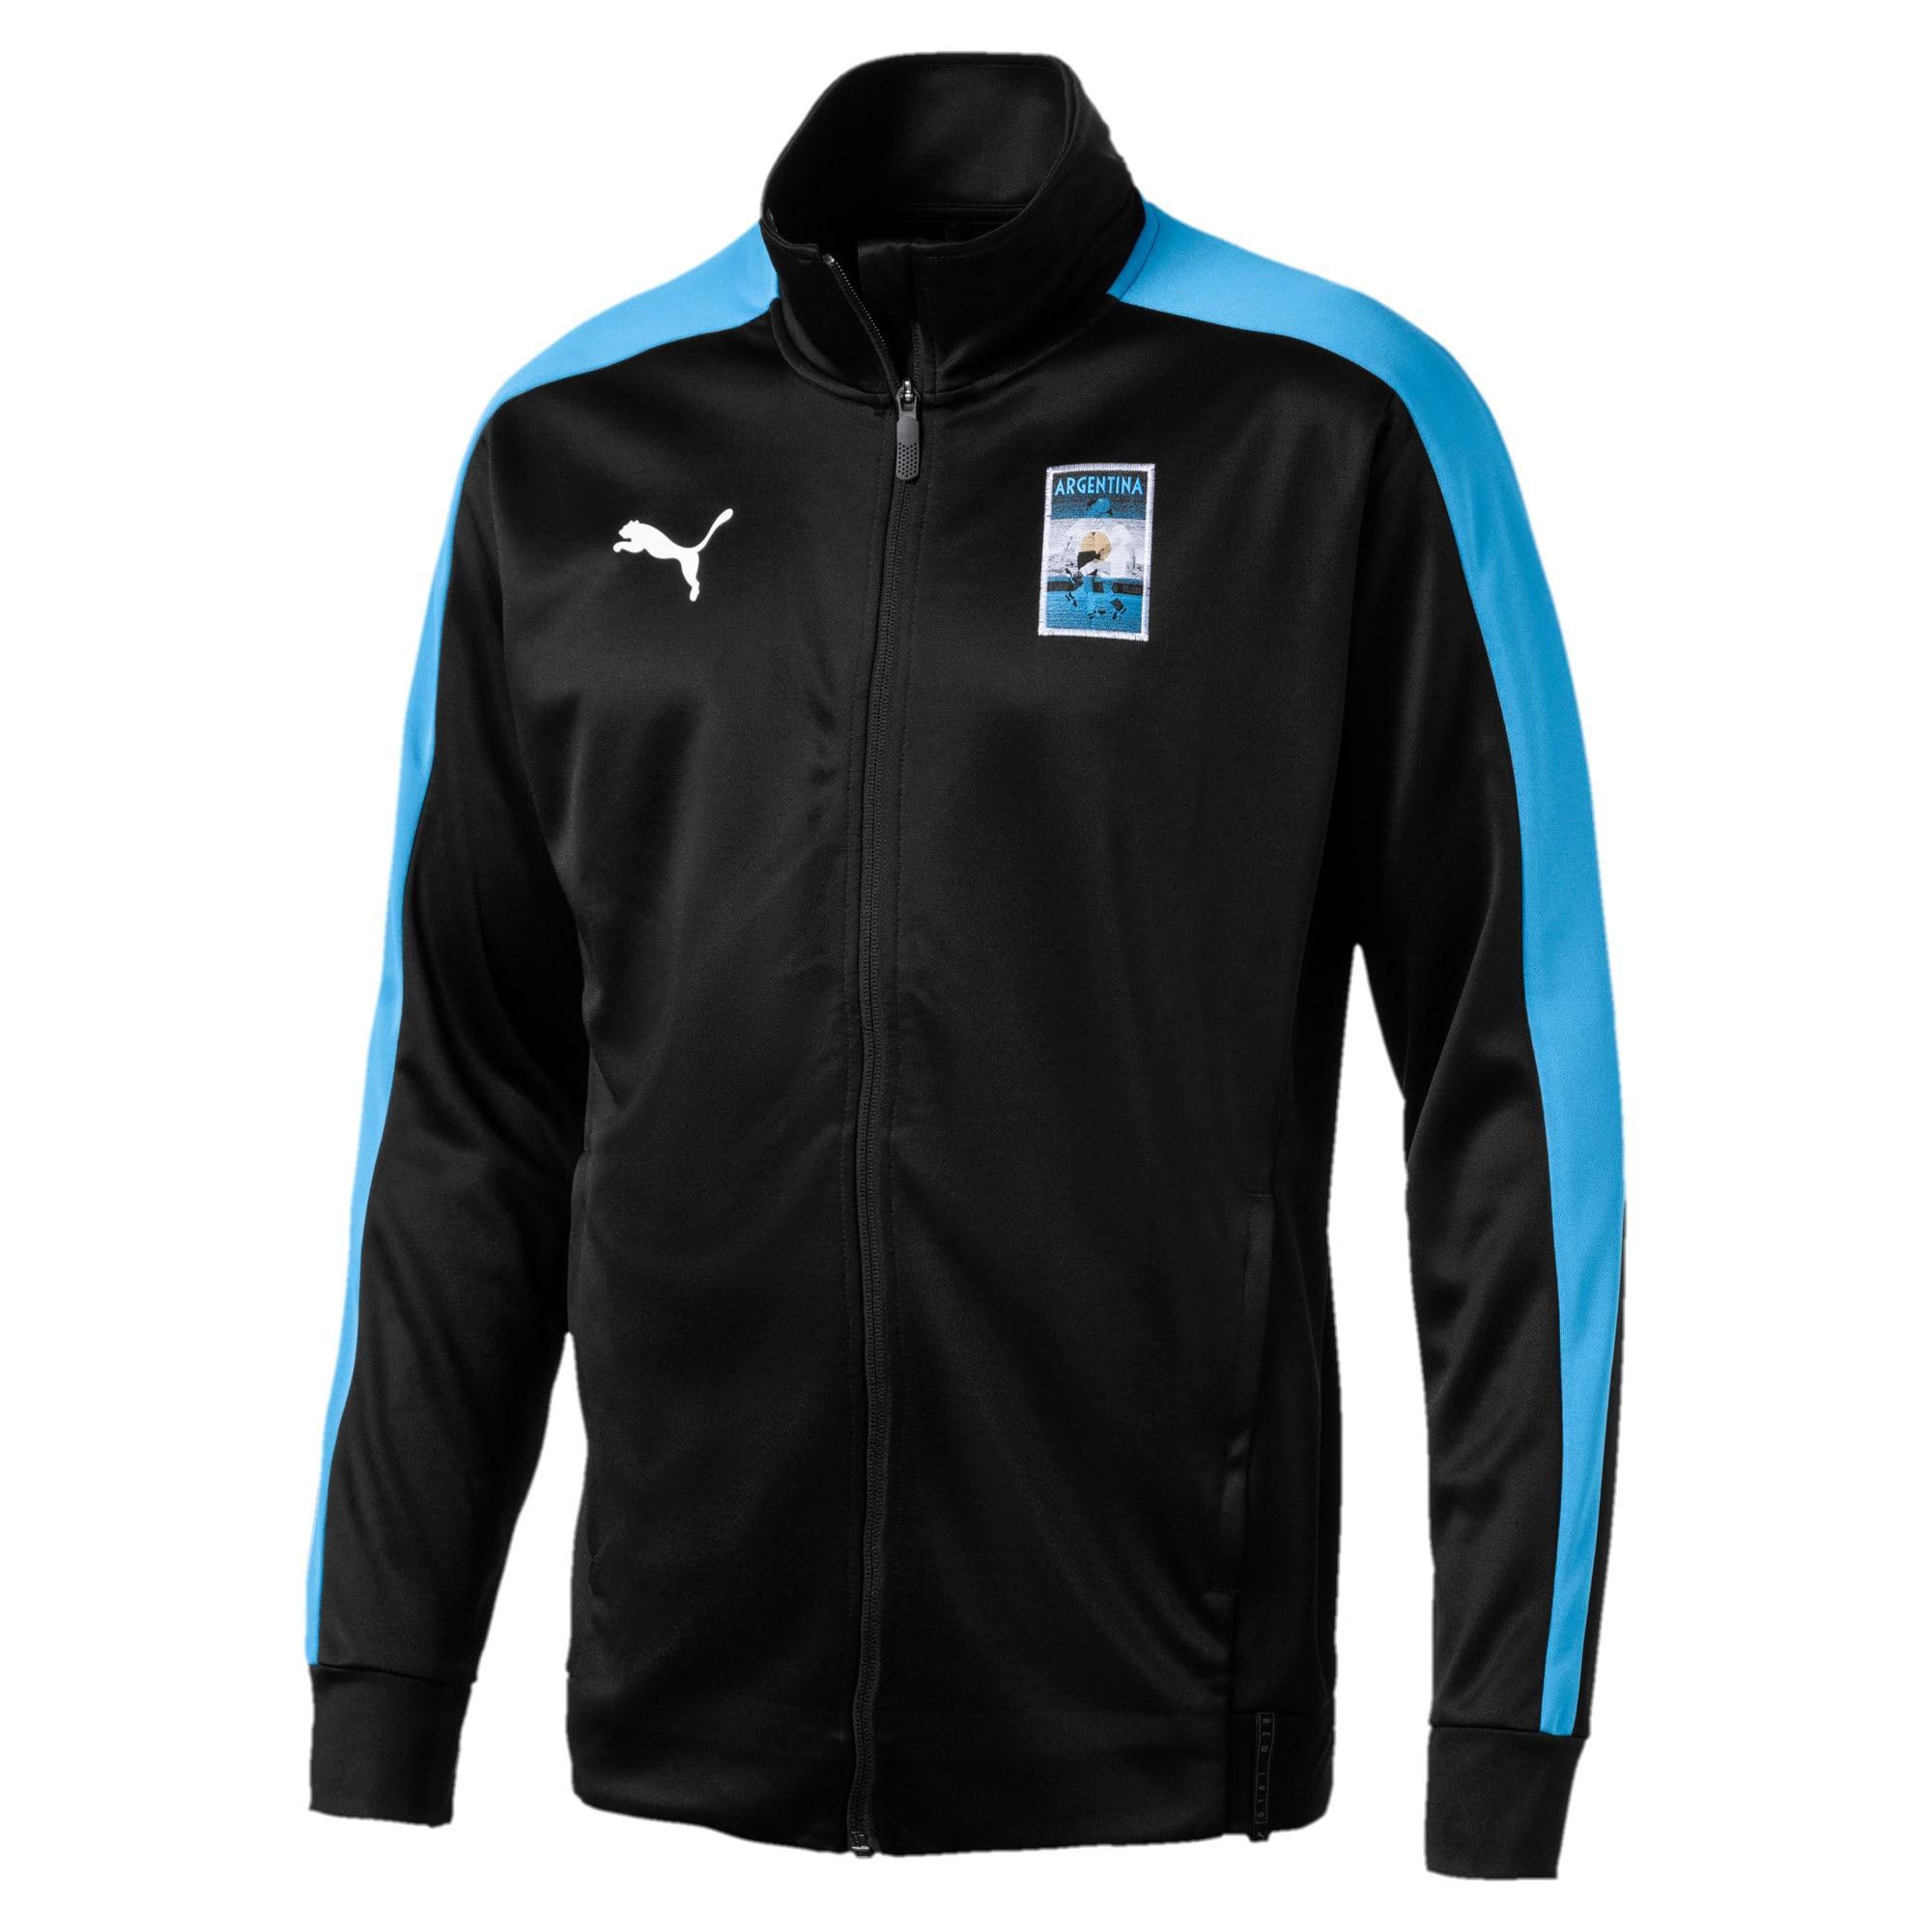 Thumbnail 2 of Copa America Men's T7 Track Jacket, Puma Black-AZURE BLUE, medium